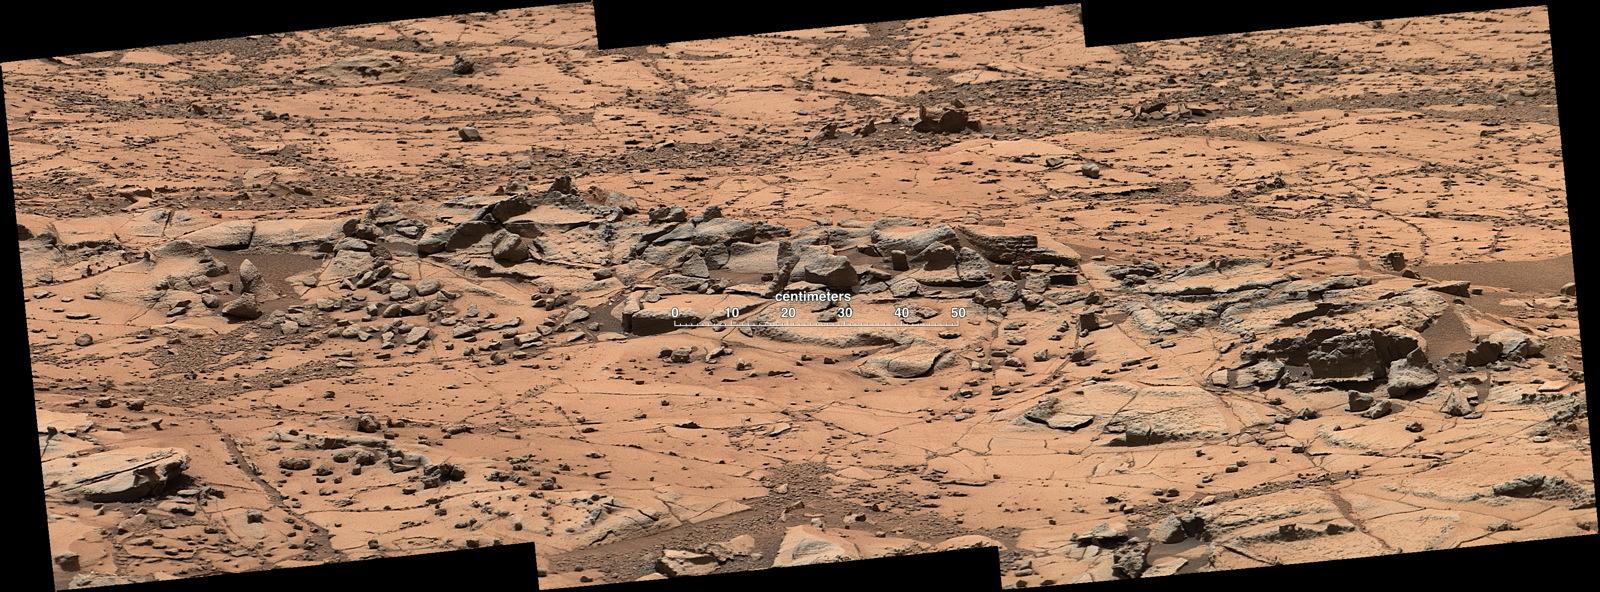 'Pink Cliffs' Resist Erosion on Mars